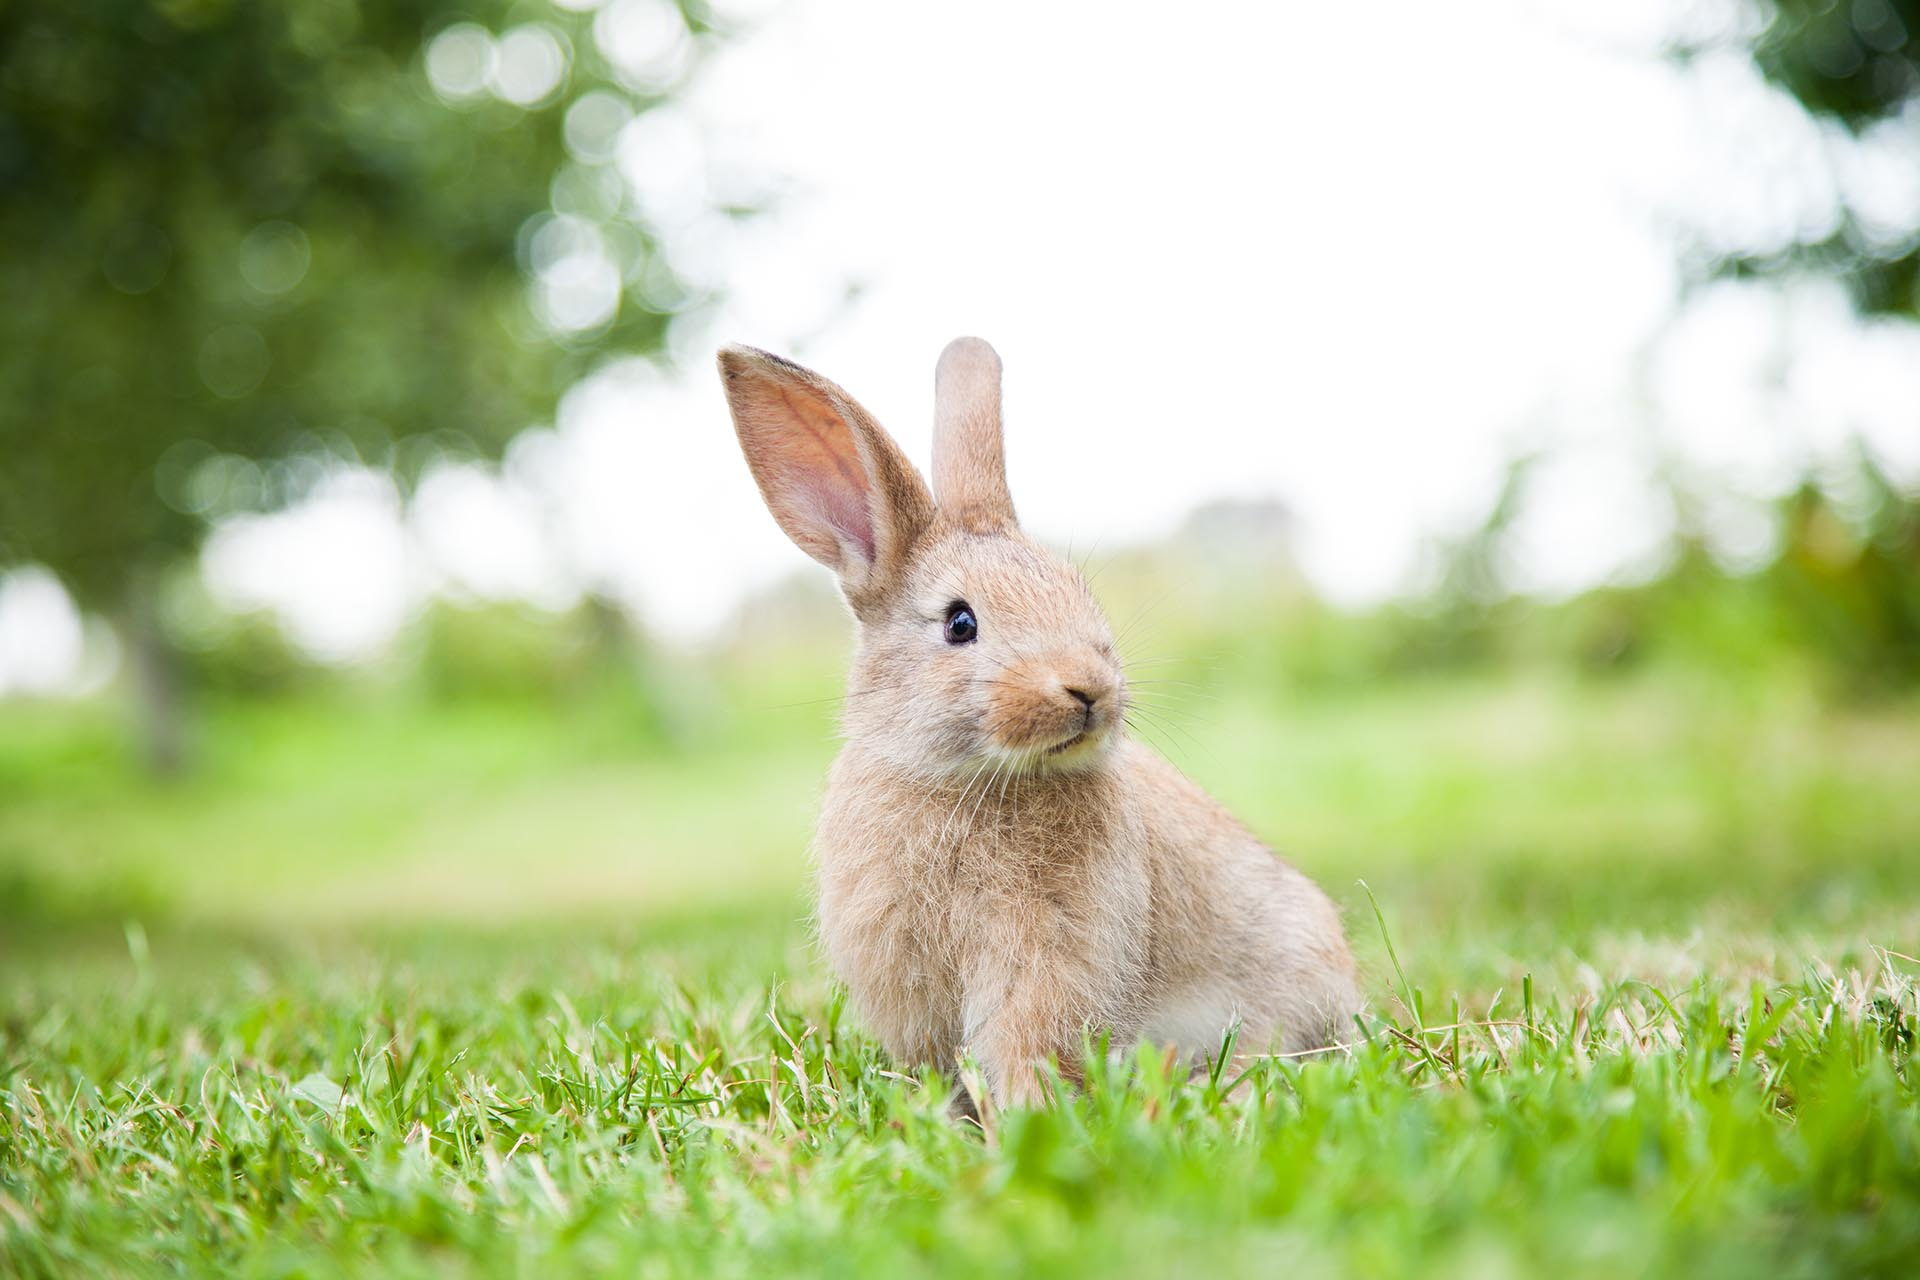 Bunny rabbit on the grass.